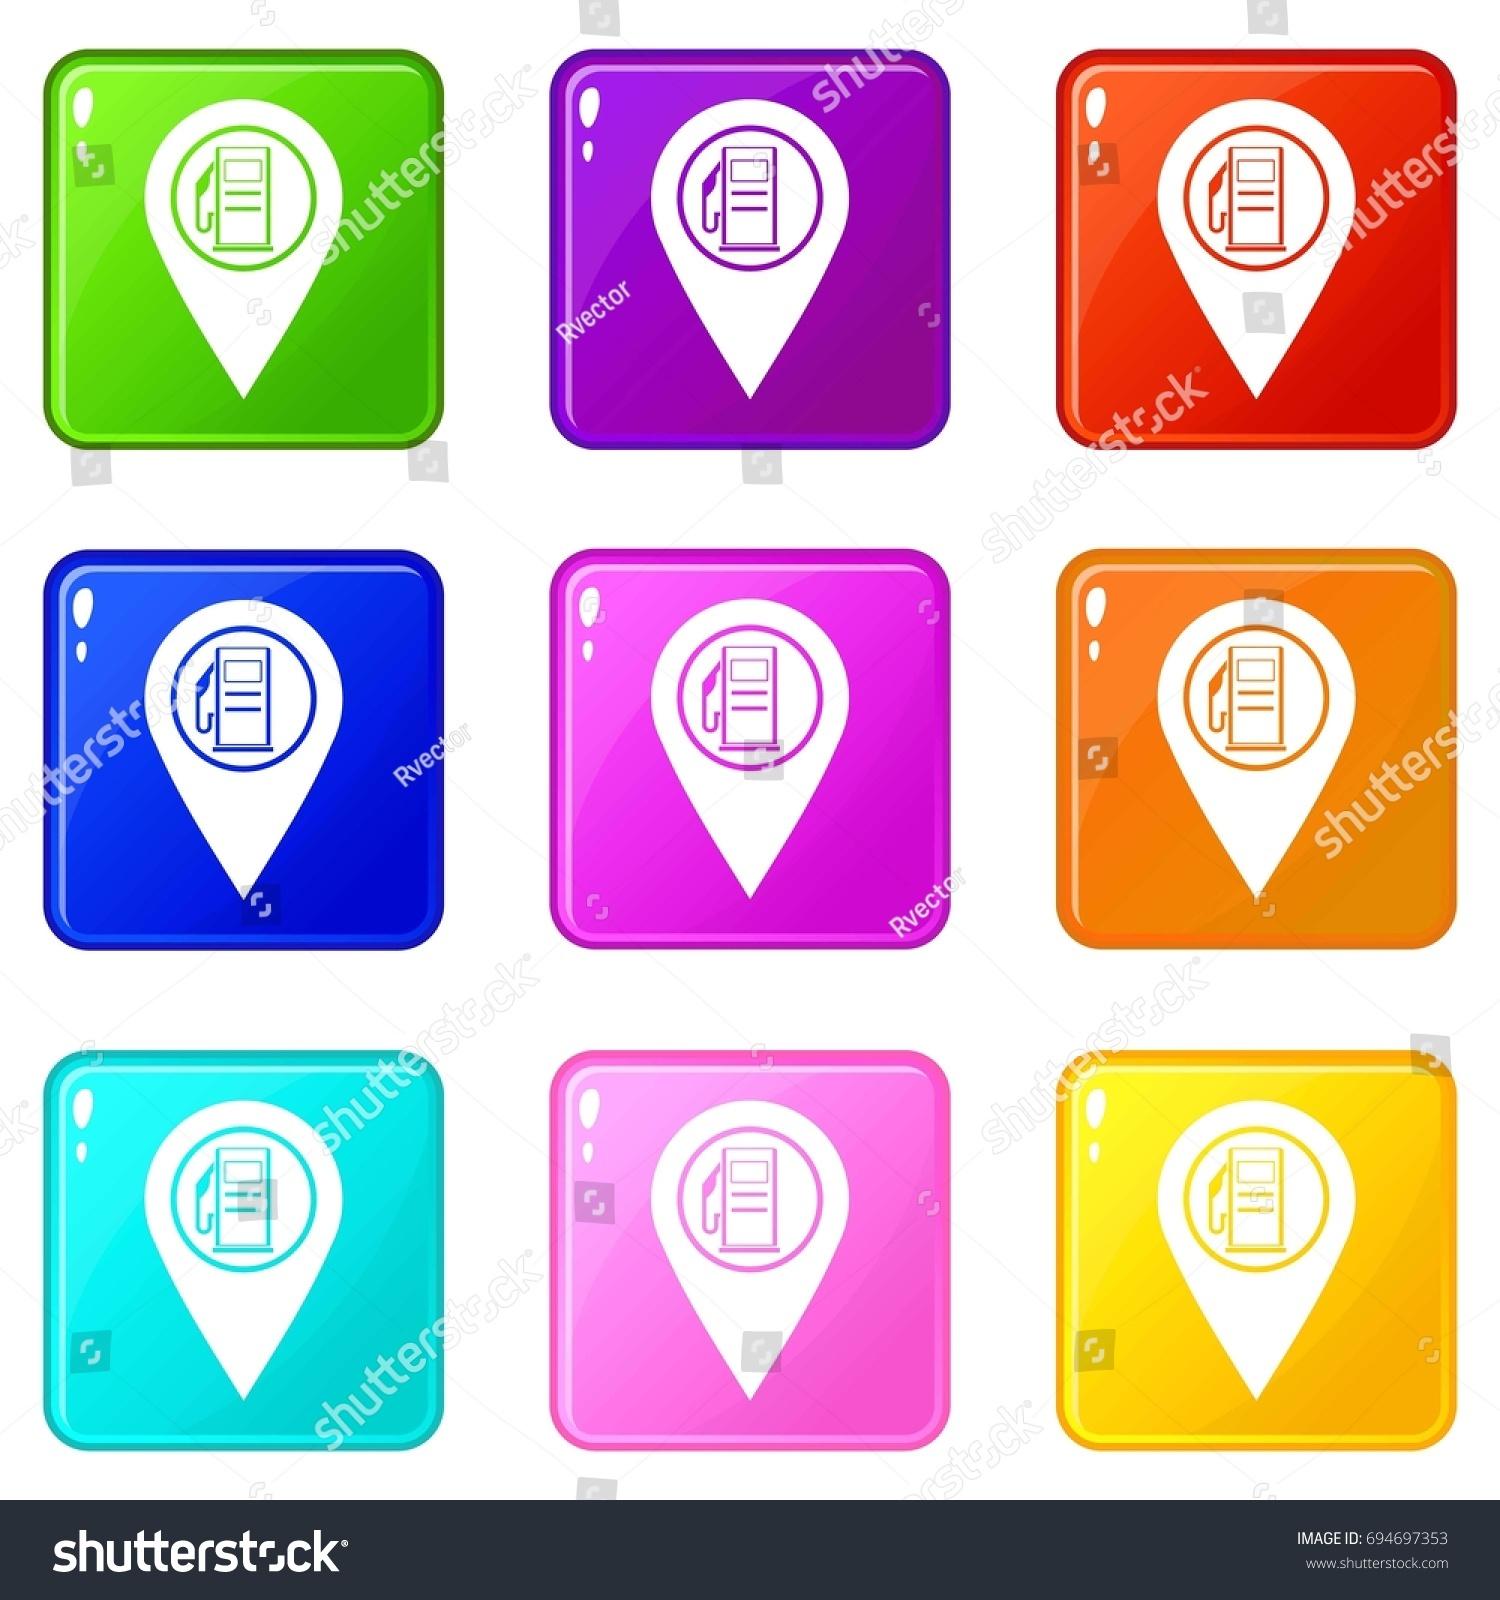 Map Pointer Gas Station Symbol Icons Stock Illustration 694697353